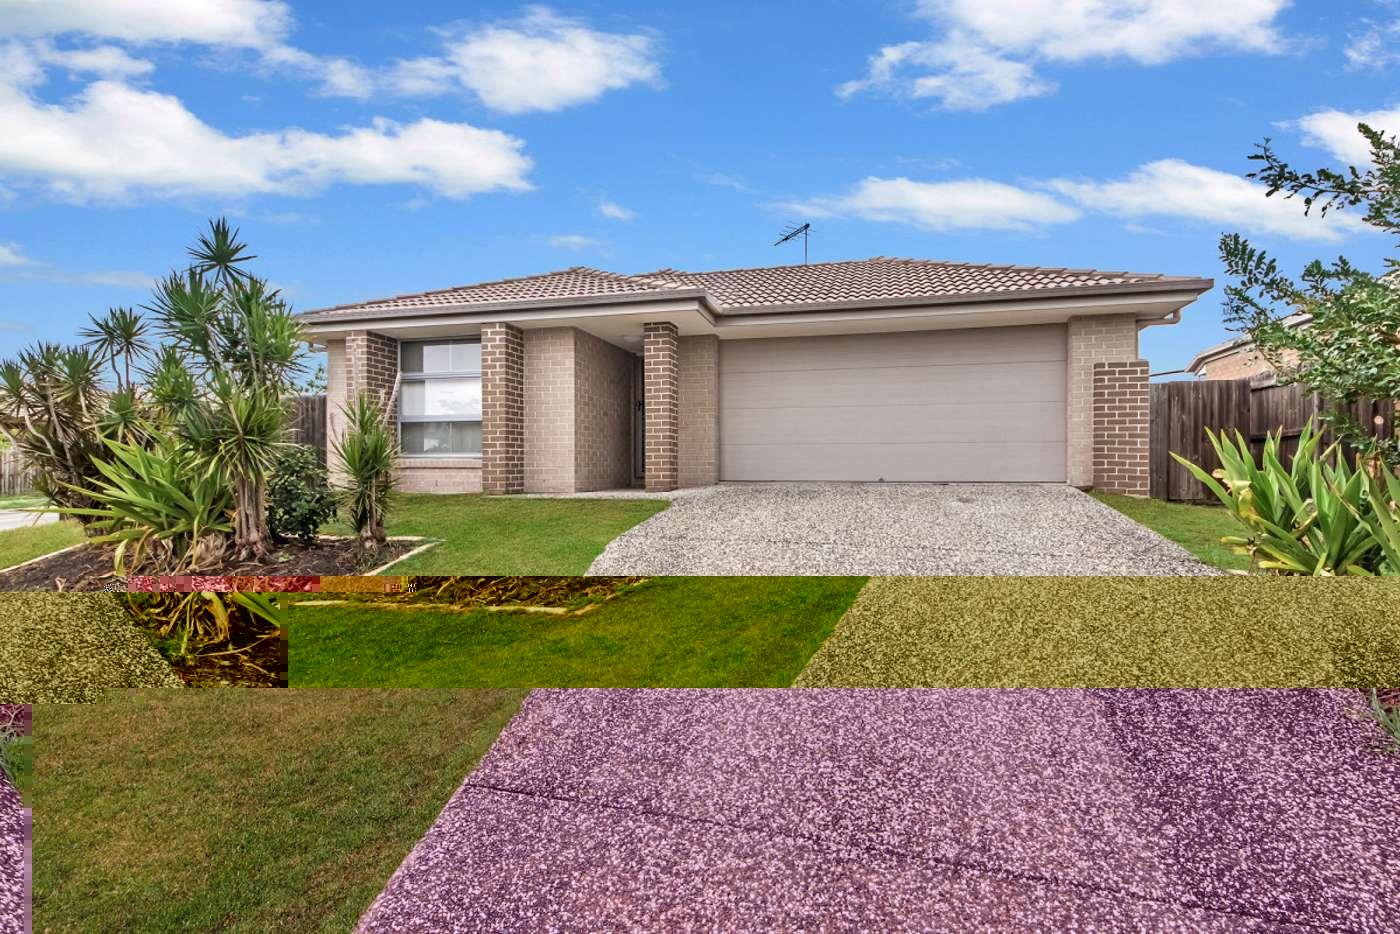 Main view of Homely house listing, 9 Denman Drive, Bundamba QLD 4304